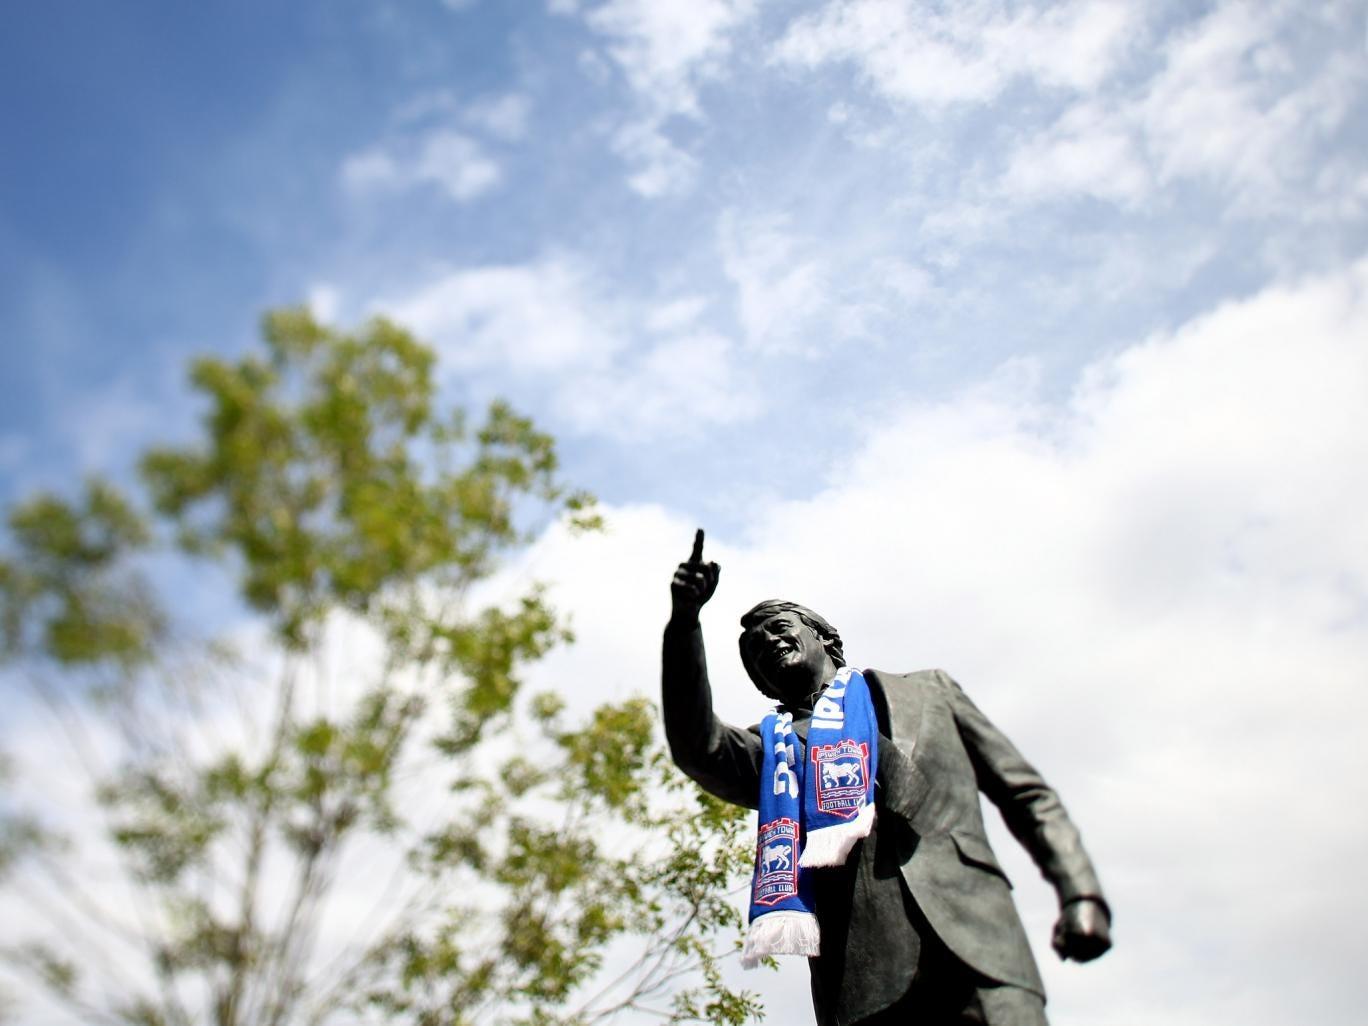 Bobby Robson statue outside Portman Road